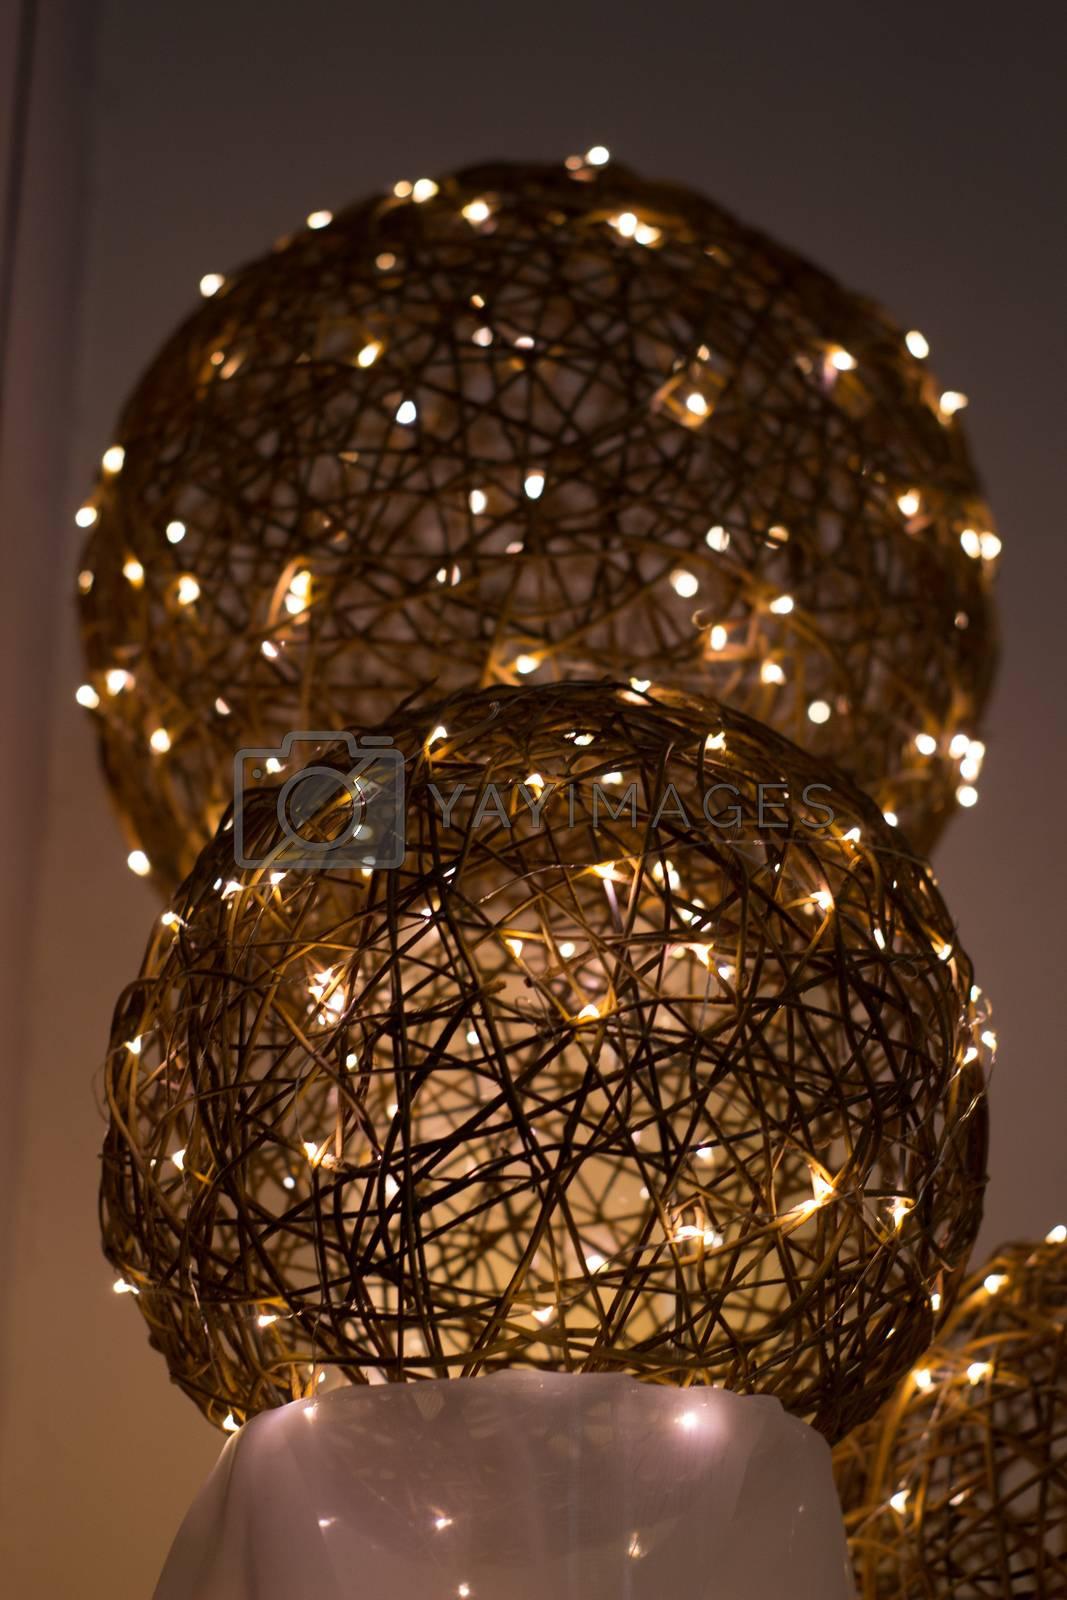 Electric garland, beautiful decorative wire beads as decoration for holiday, electric, electrical, shine, light, glow, world society color shine glow radiate beam glisten wire conductor lamp bulb tube